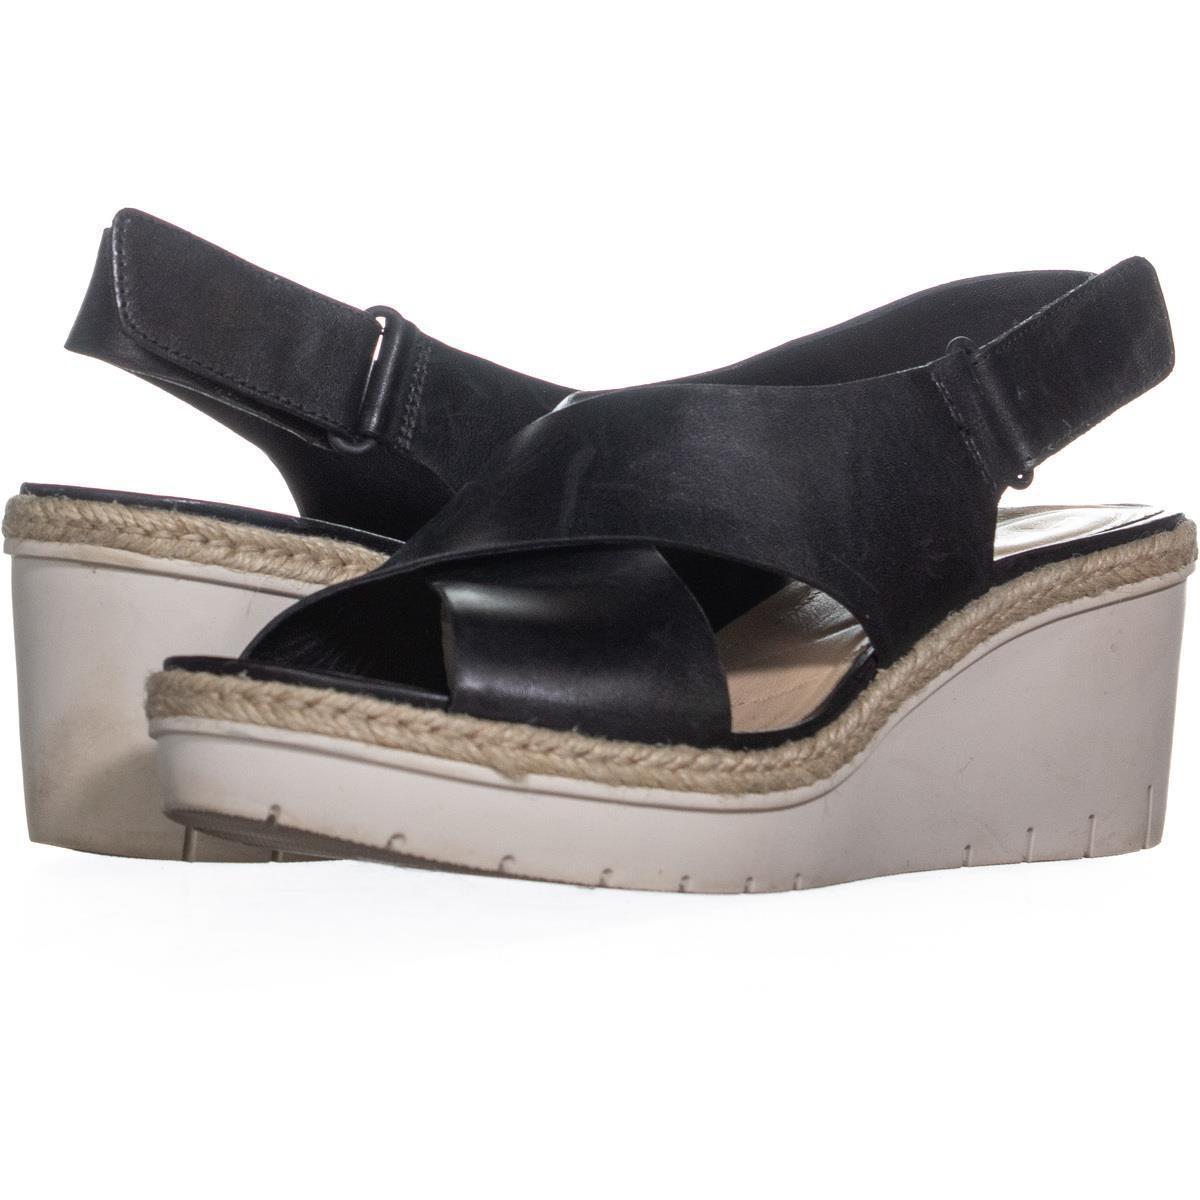 5e1f7a96fd2 Su 73902 clarks palm glow criss cross wedge sandals black leather 1